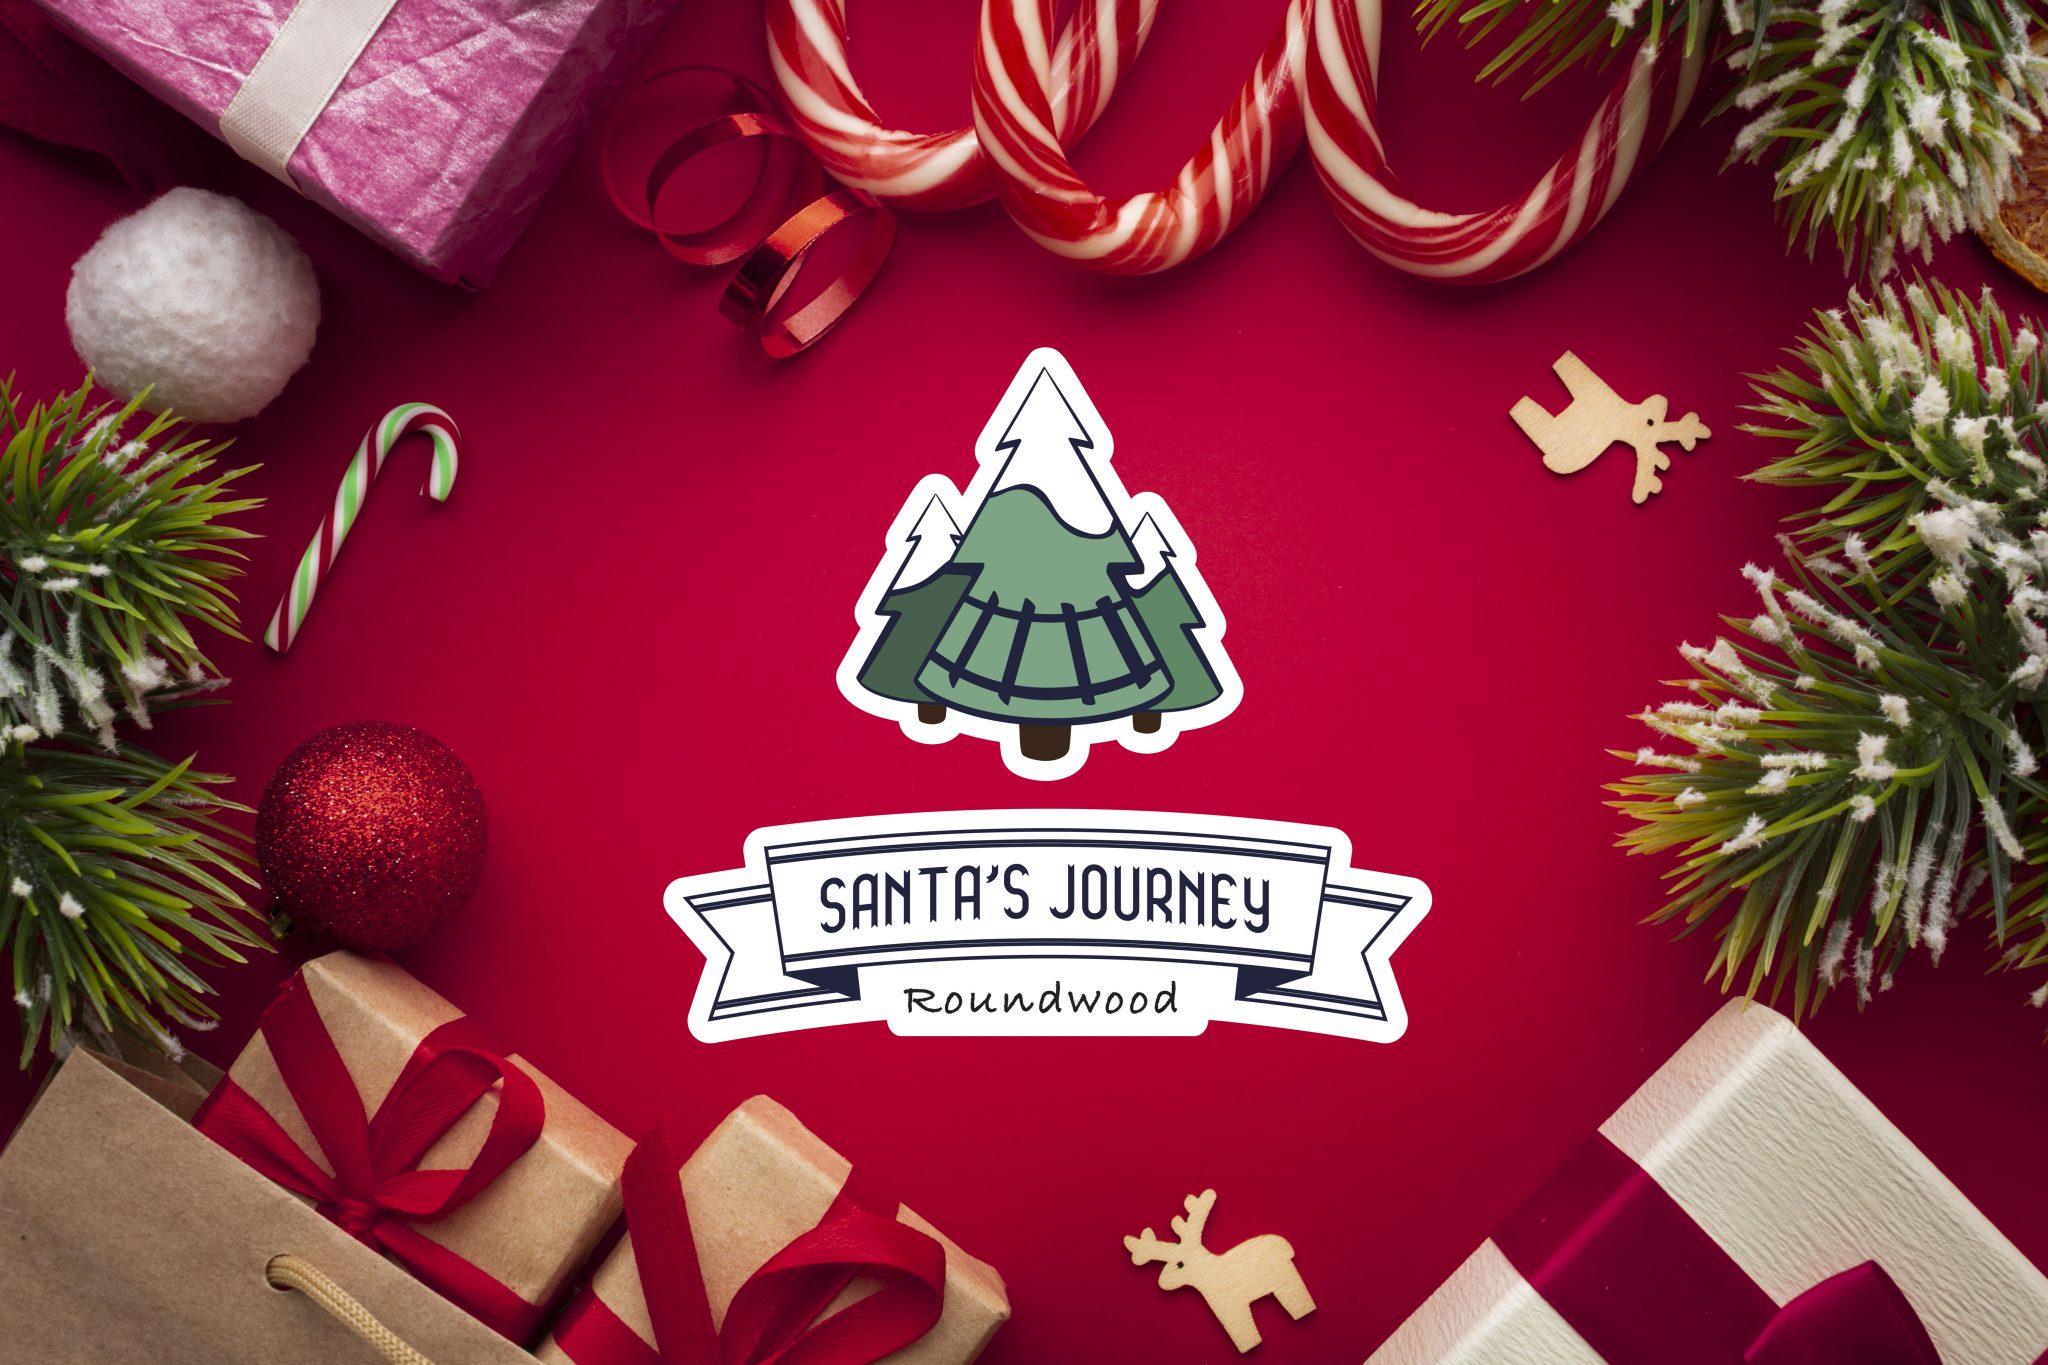 santas-journey-logo